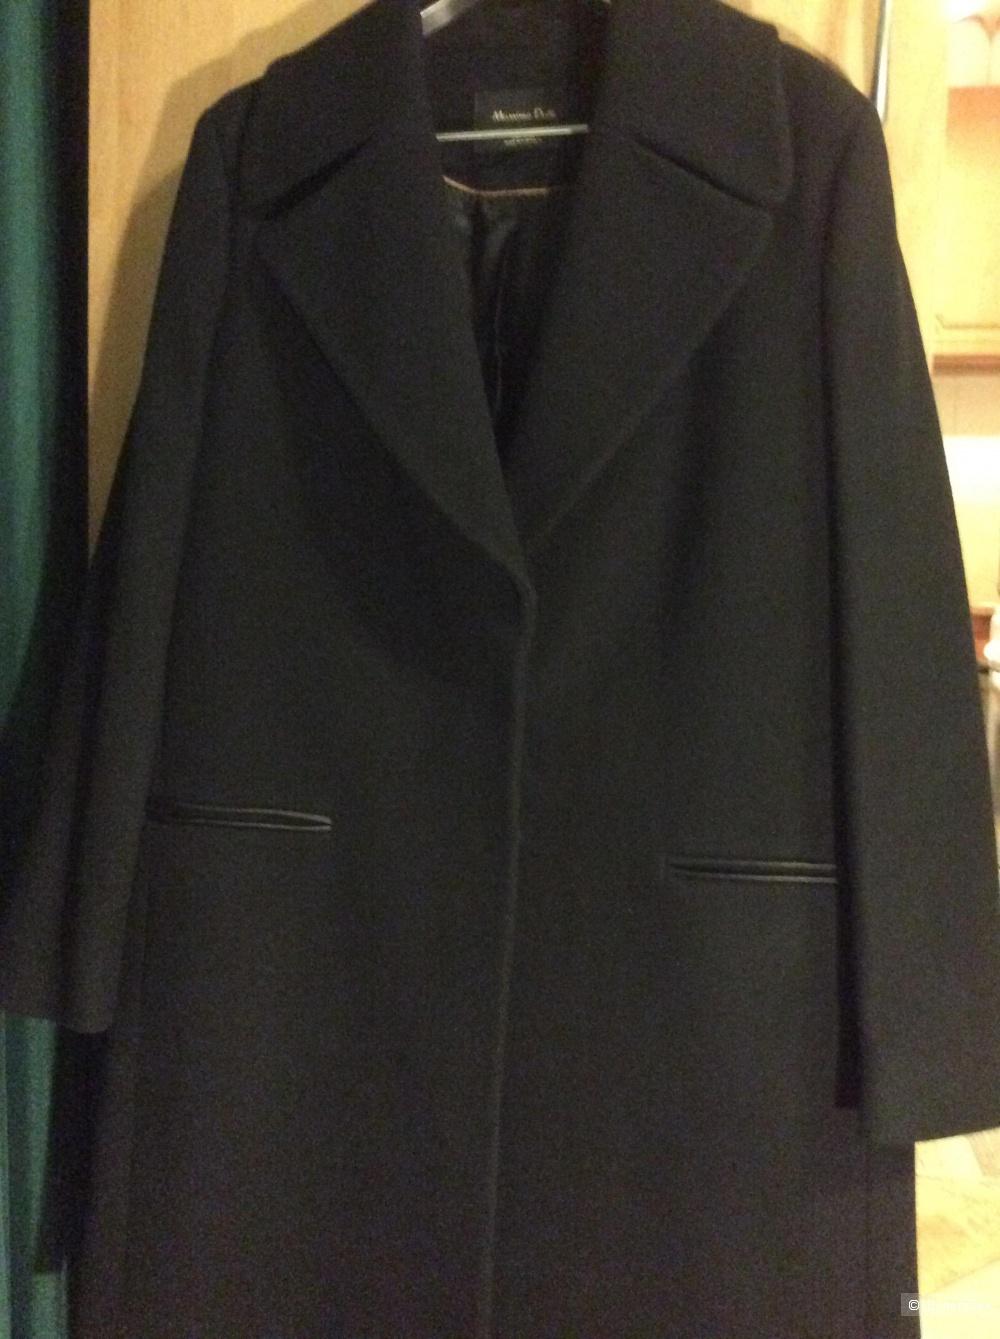 Новое пальто Massimo Dutti, размер 50 +/-.